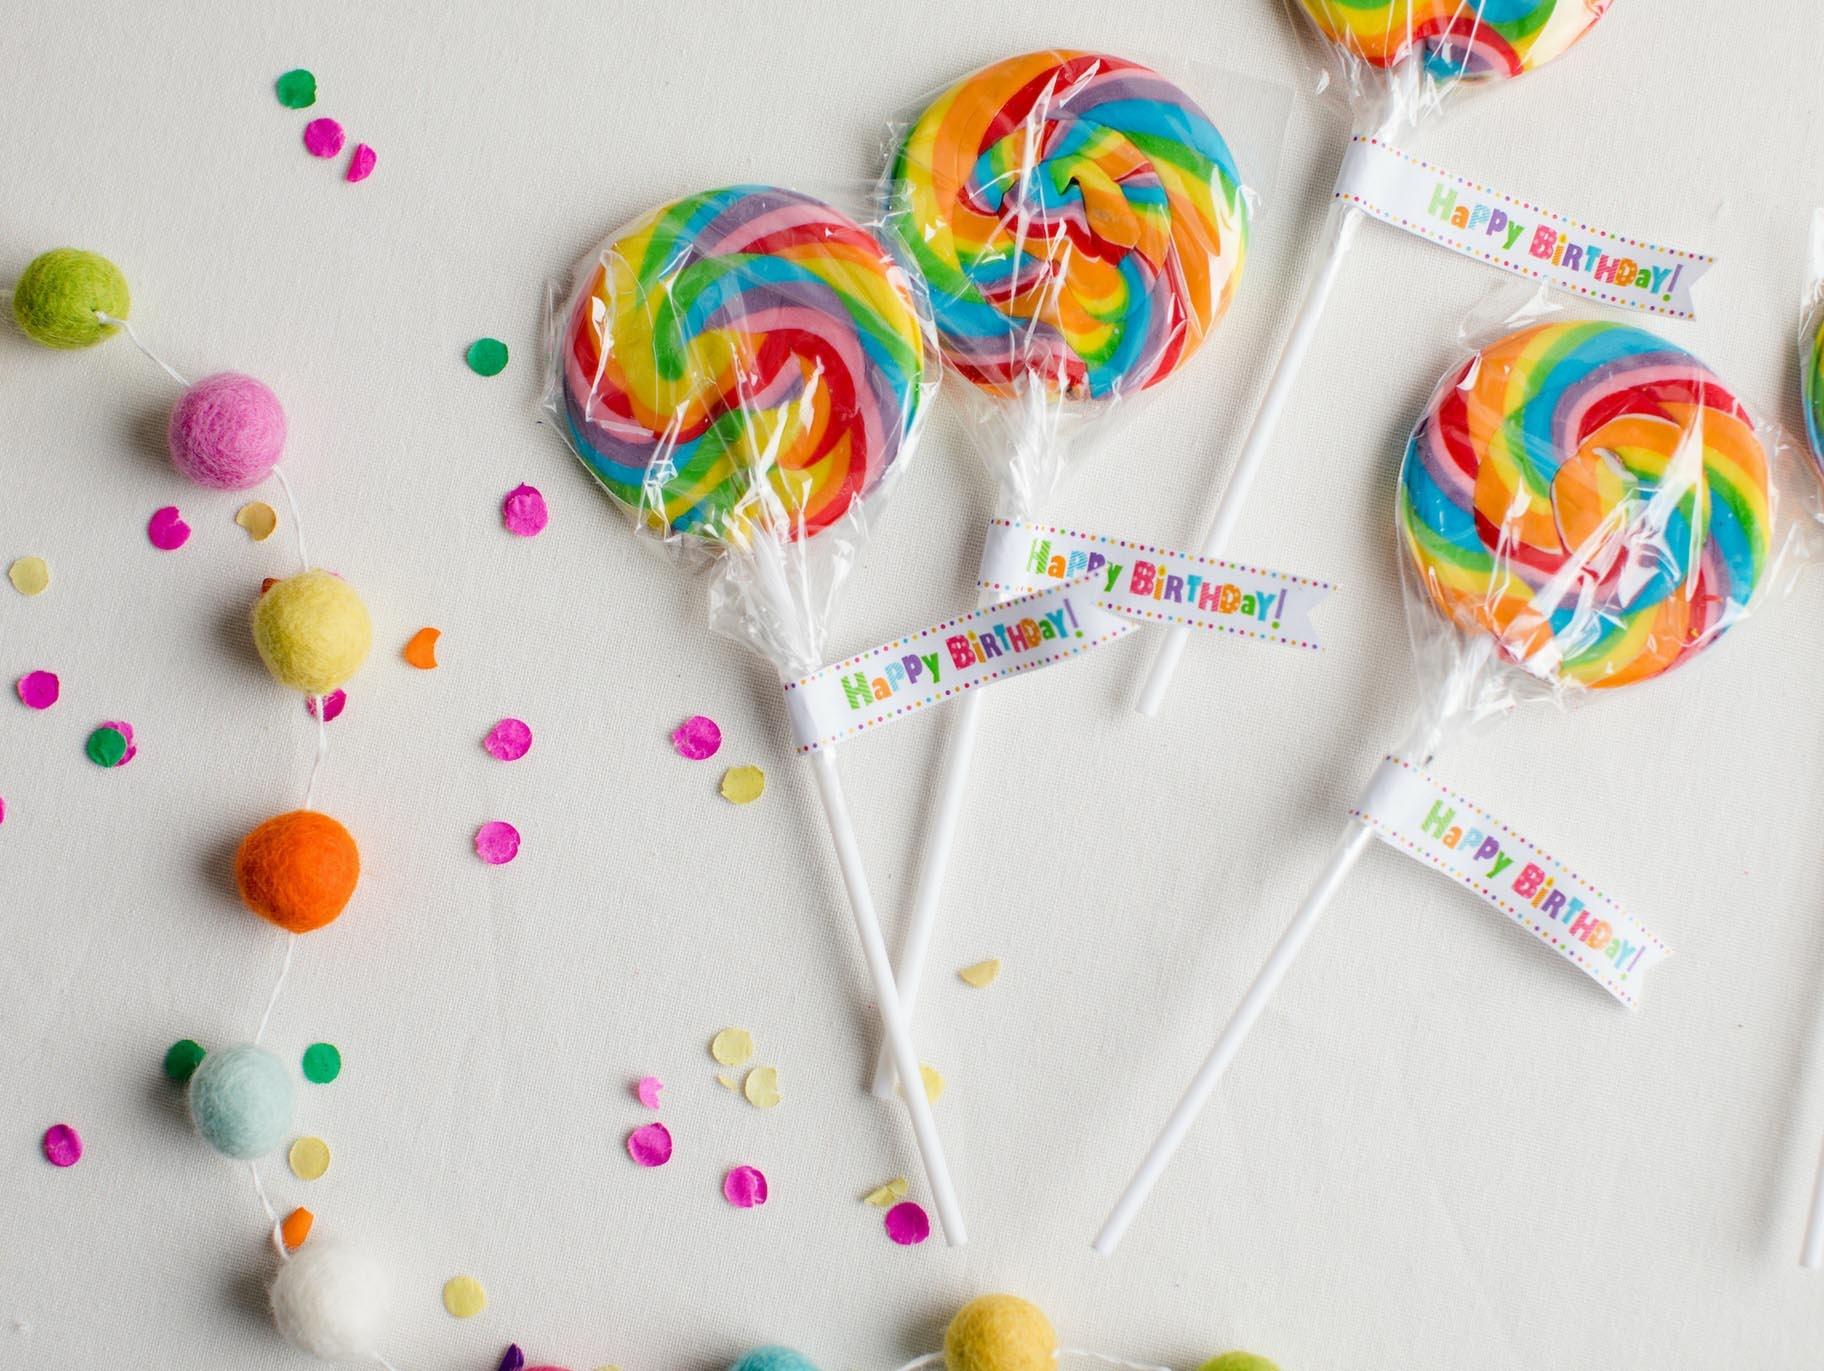 Free Printable Birthday Party Favor Tags | Fun365 - Birthday Party Favor Tags Printable Free